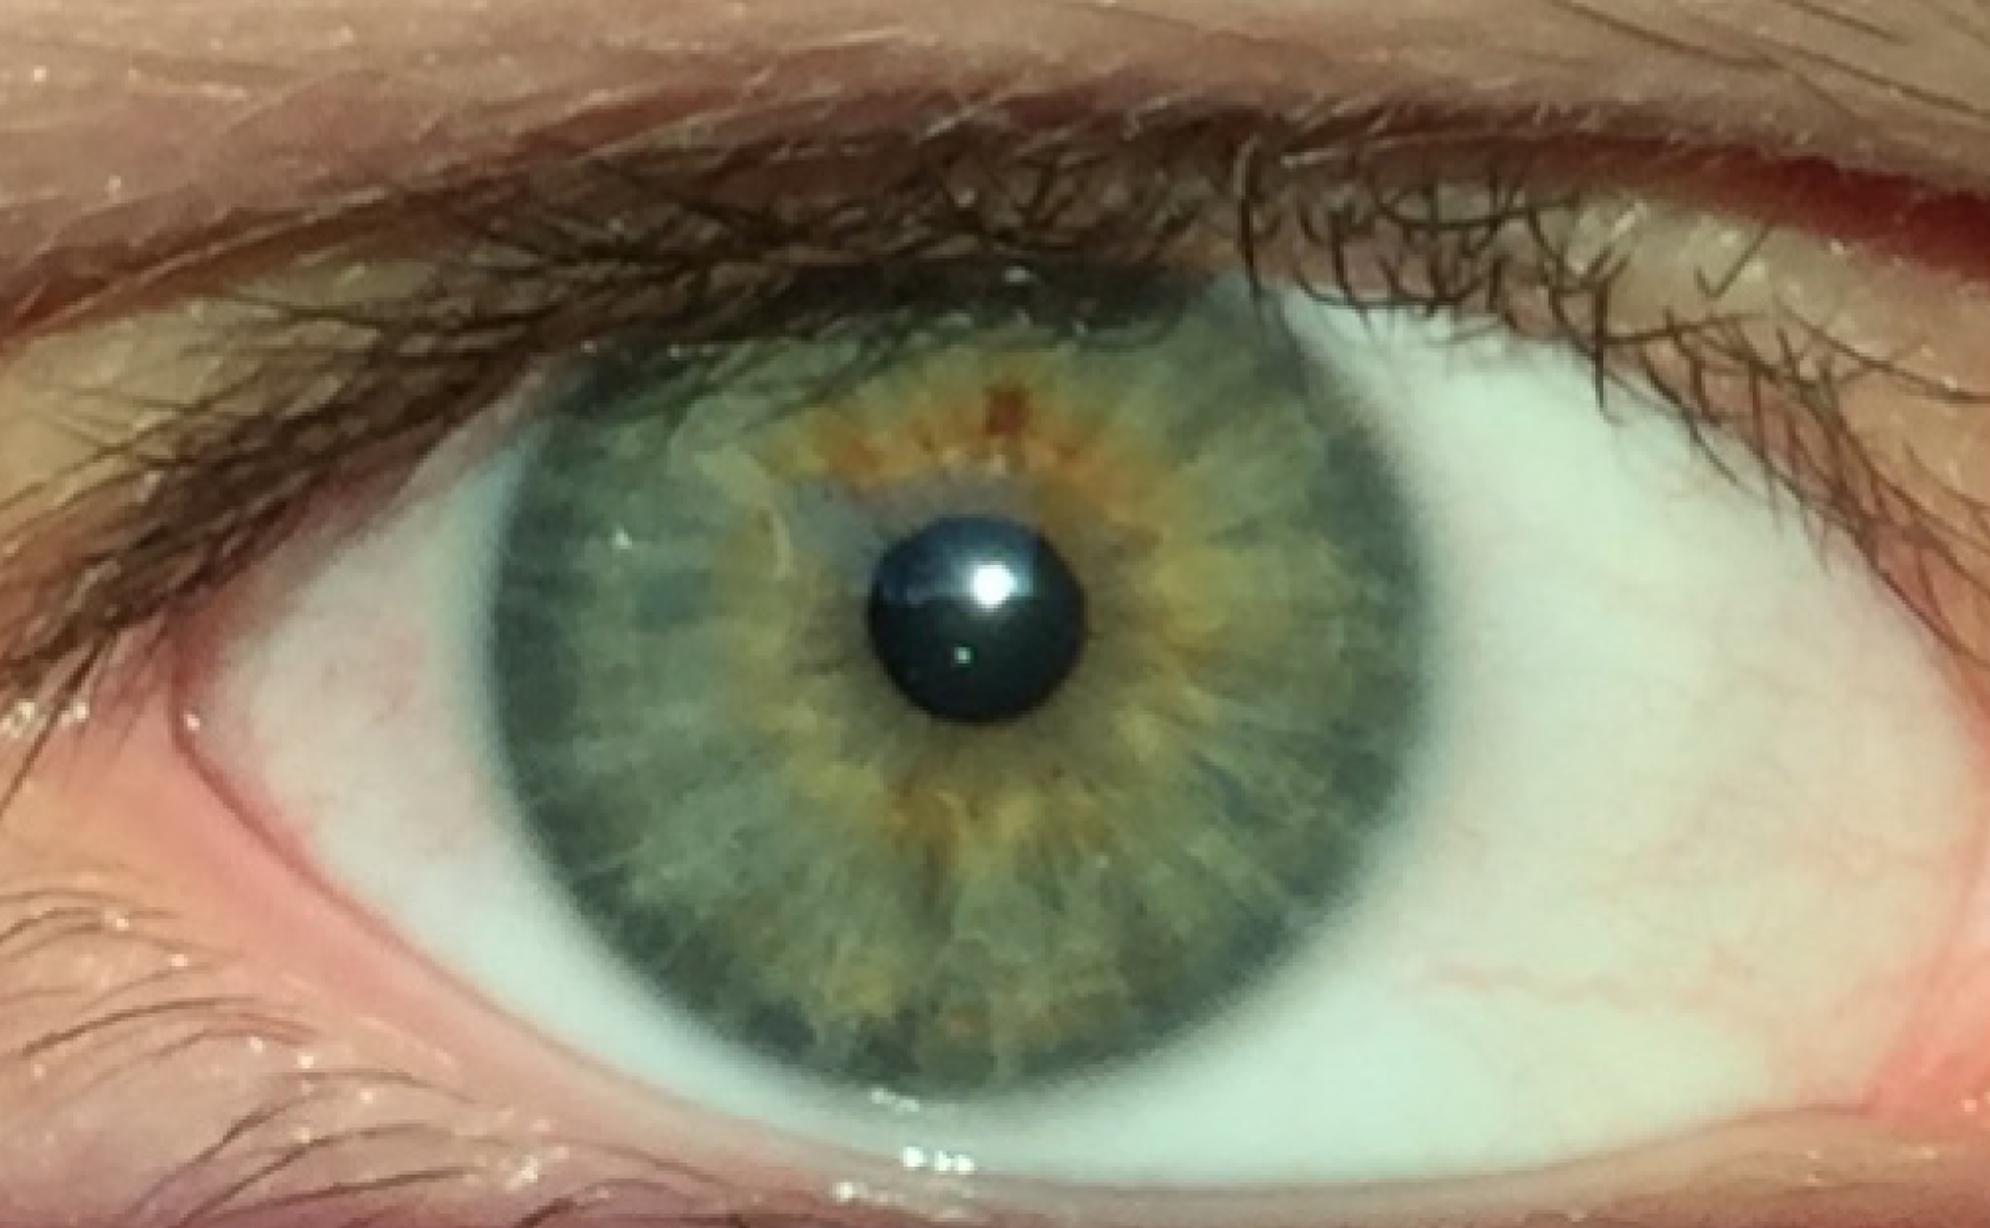 ficheirogreen eyes humanpng � wikip233dia a enciclop233dia